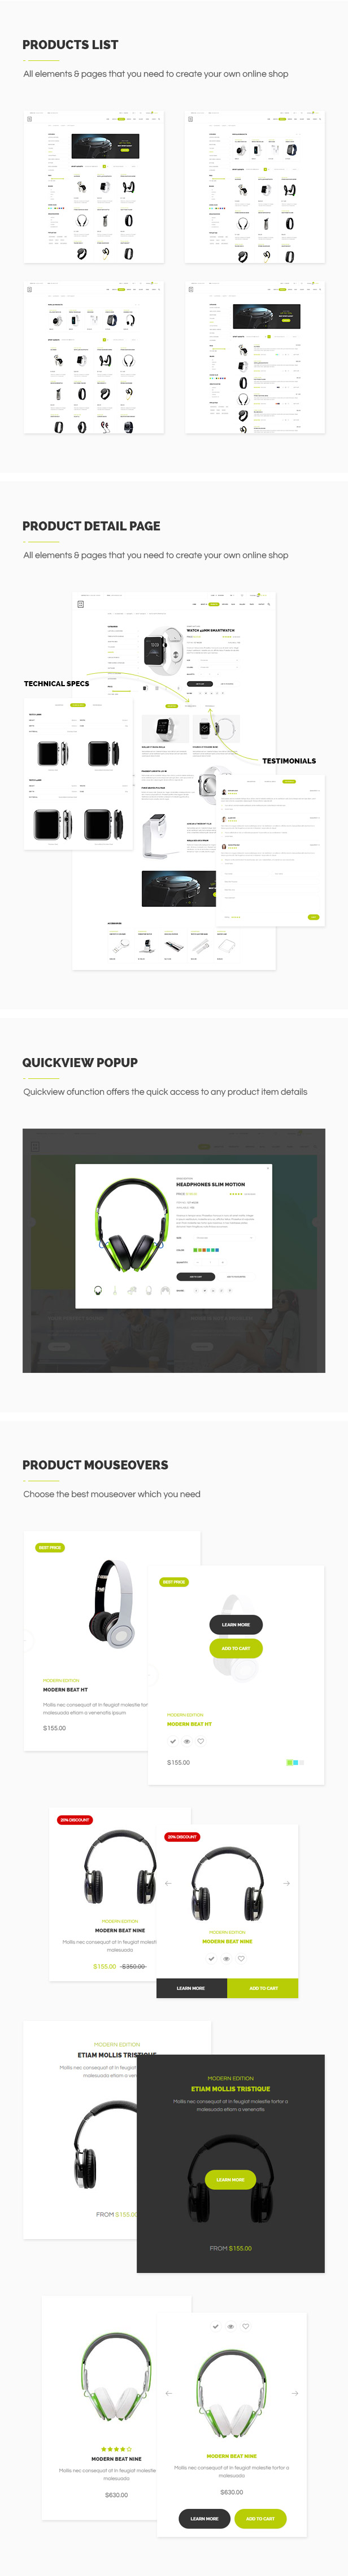 Exzo - Modern & Unique Electronics eCommerce HTML Template - 2